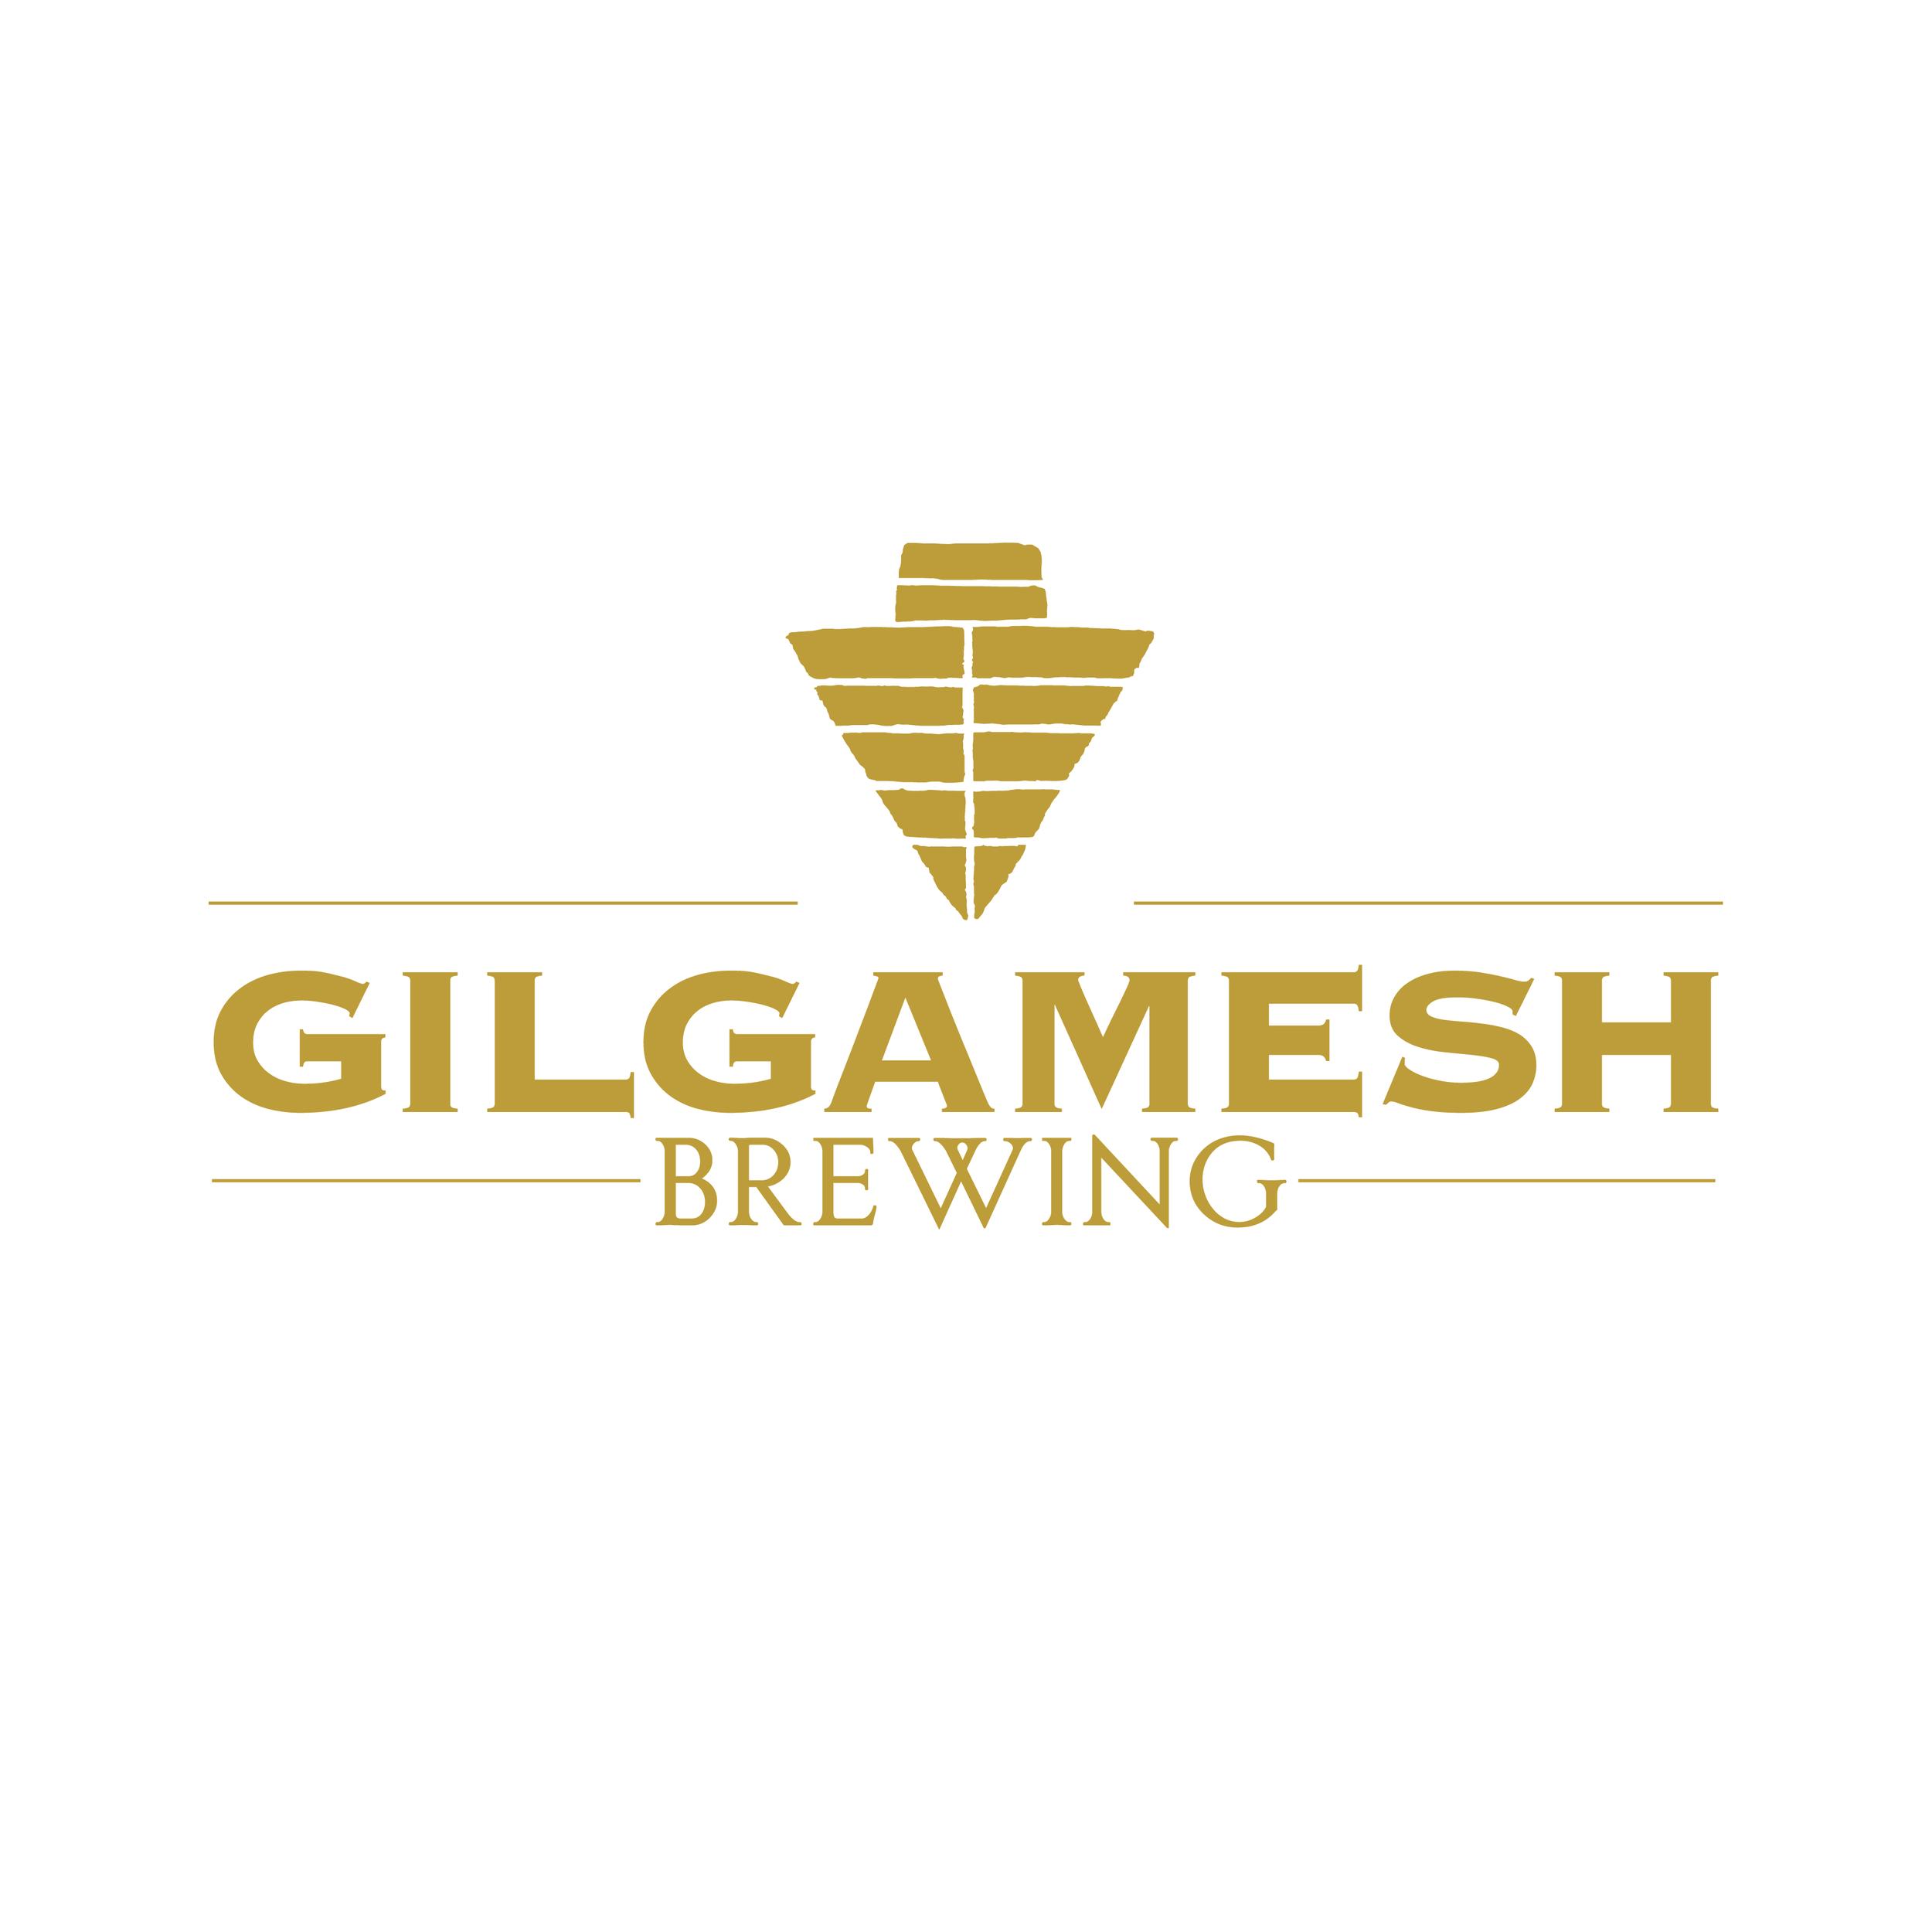 Gilgamesh-01.png